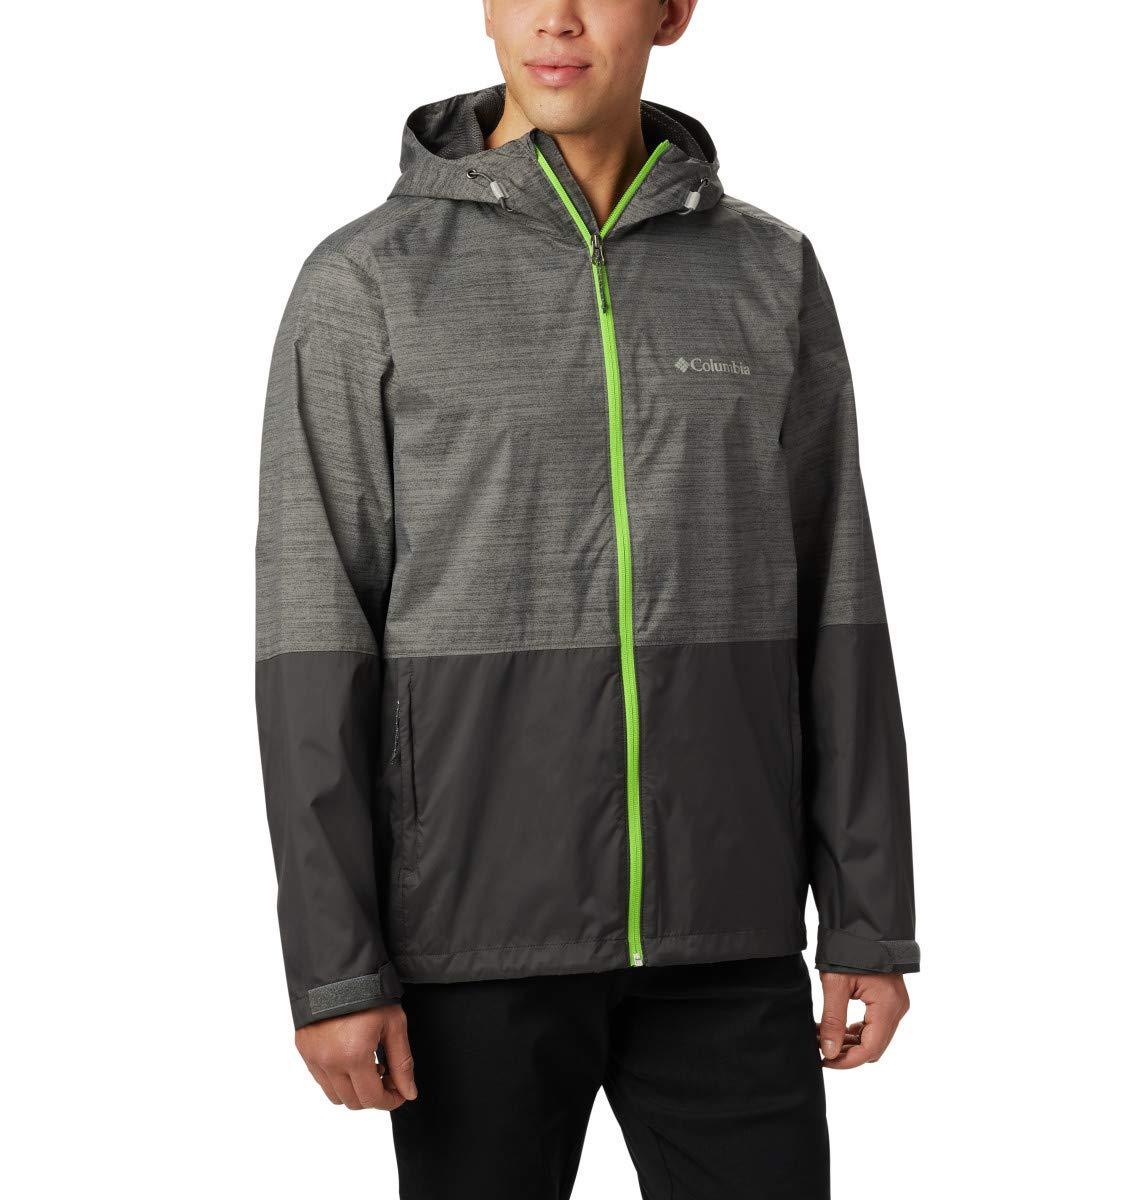 Columbia Men's Roan Mountain Jacket, City Grey Texture Print, Shark, Medium by Columbia